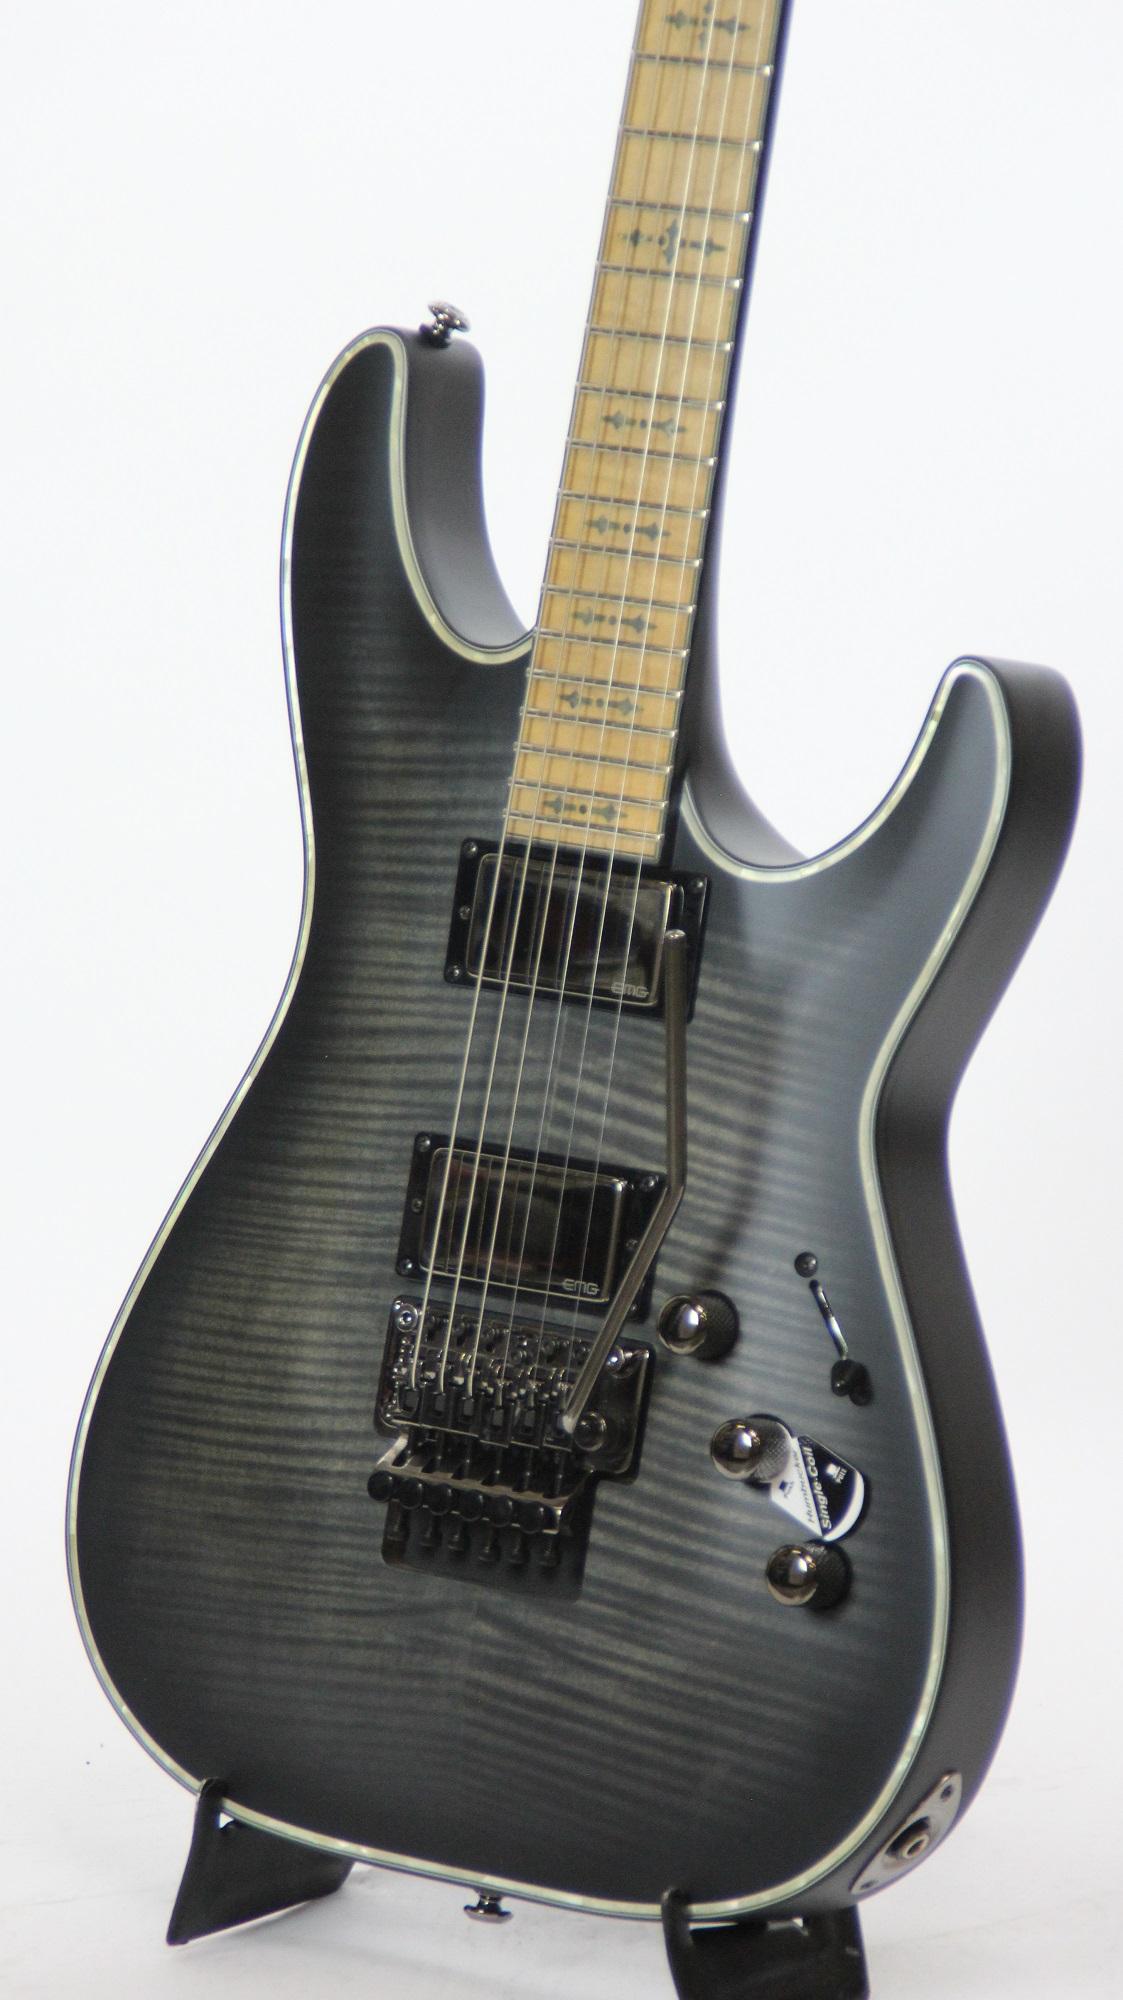 schecter hellraiser extreme c 1 fr m see thru black satin 1872 electric guitar 839212007251 ebay. Black Bedroom Furniture Sets. Home Design Ideas